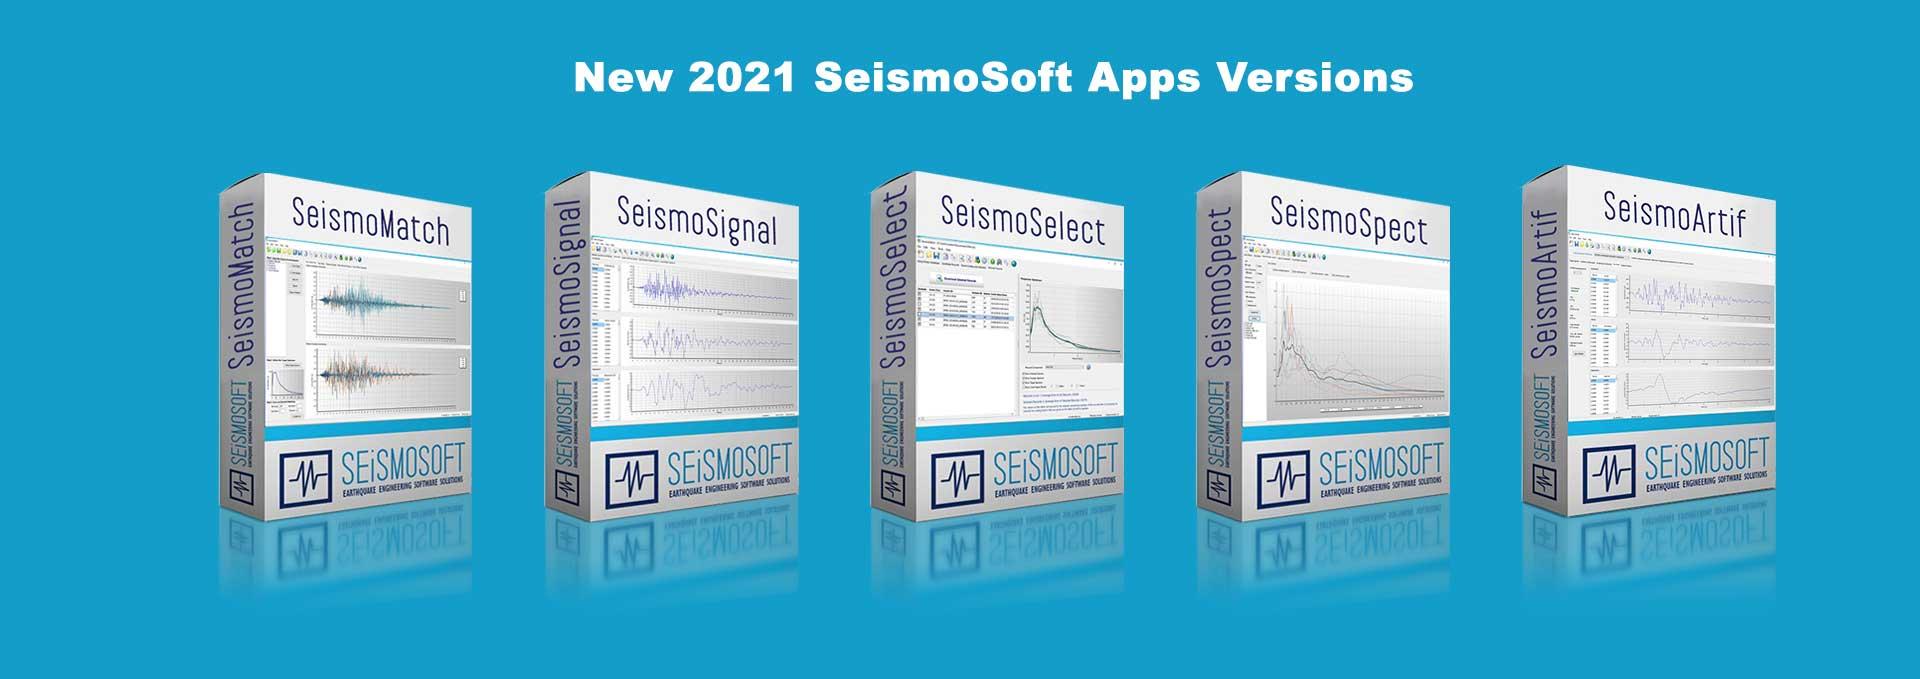 New Seismosoft 2021 Apps